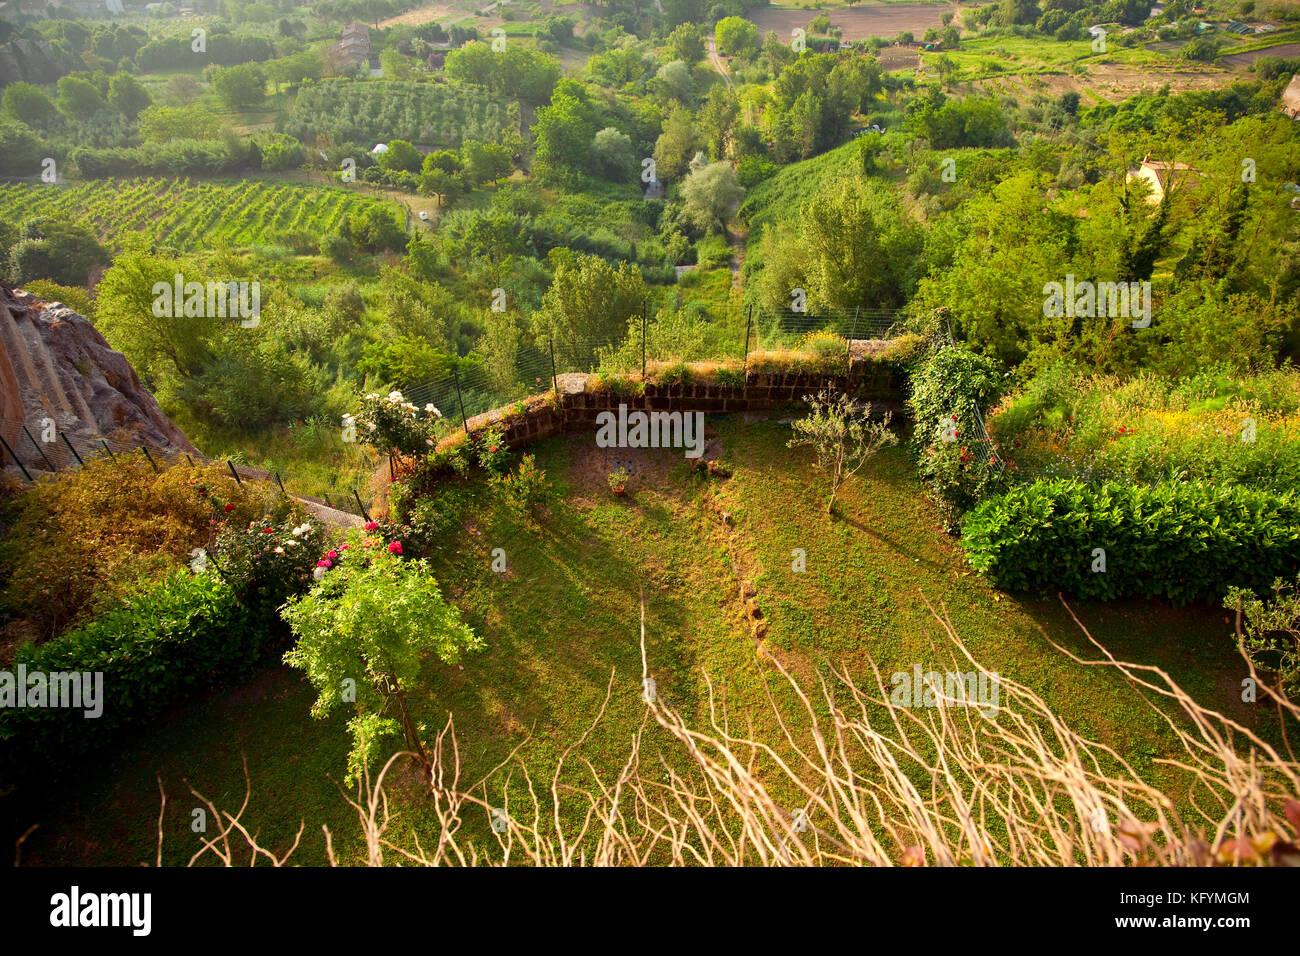 The green hillside of Orvieto, Italy. - Stock Image